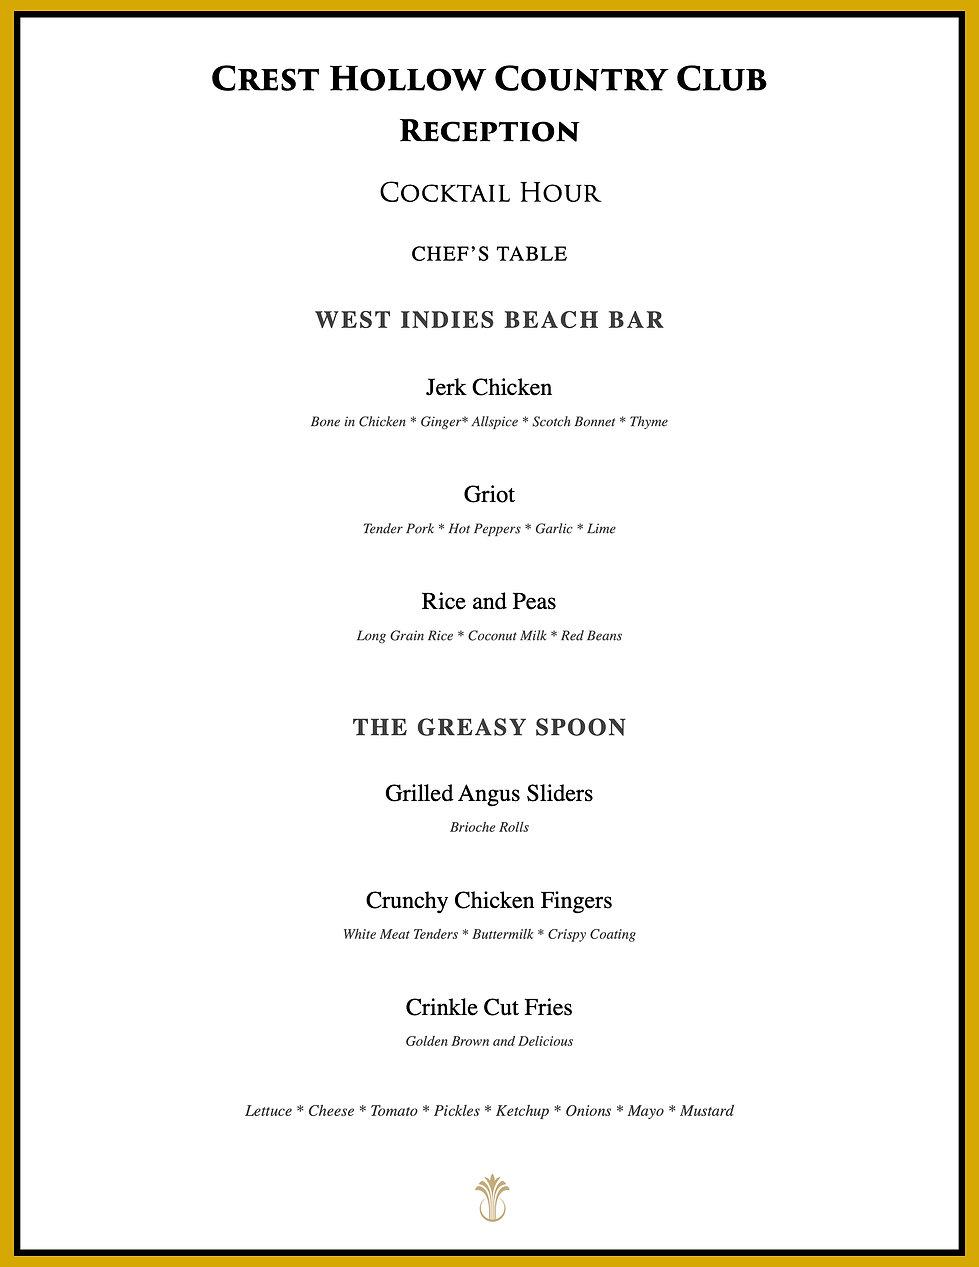 Reception Menu - Page 7.jpg